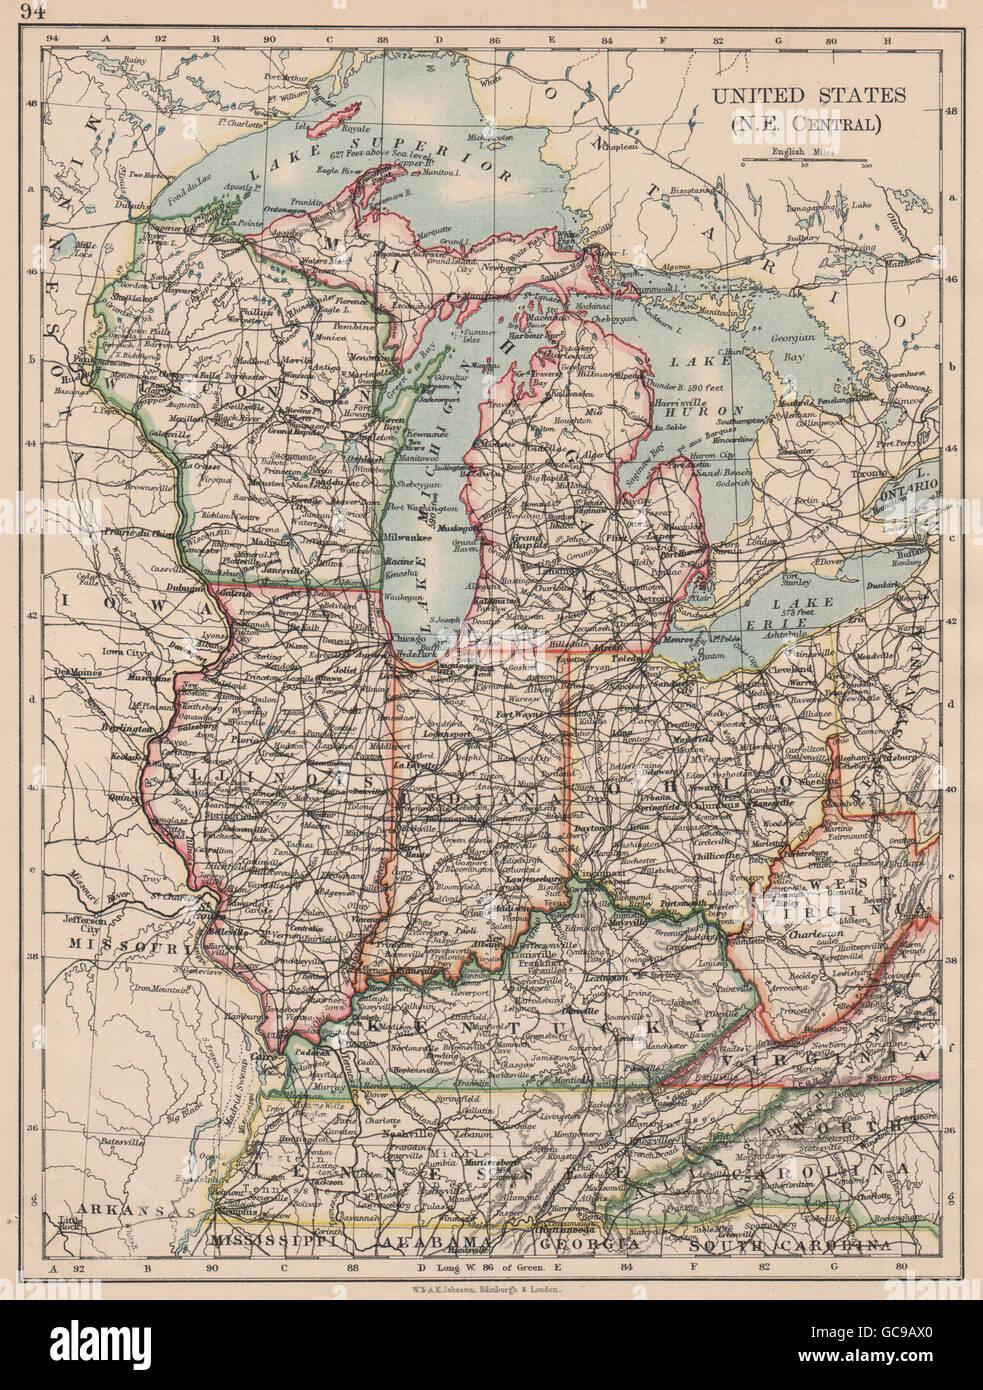 usa mid west wisconsin michigan illinois ohio indiana kentucky tn 1897 map